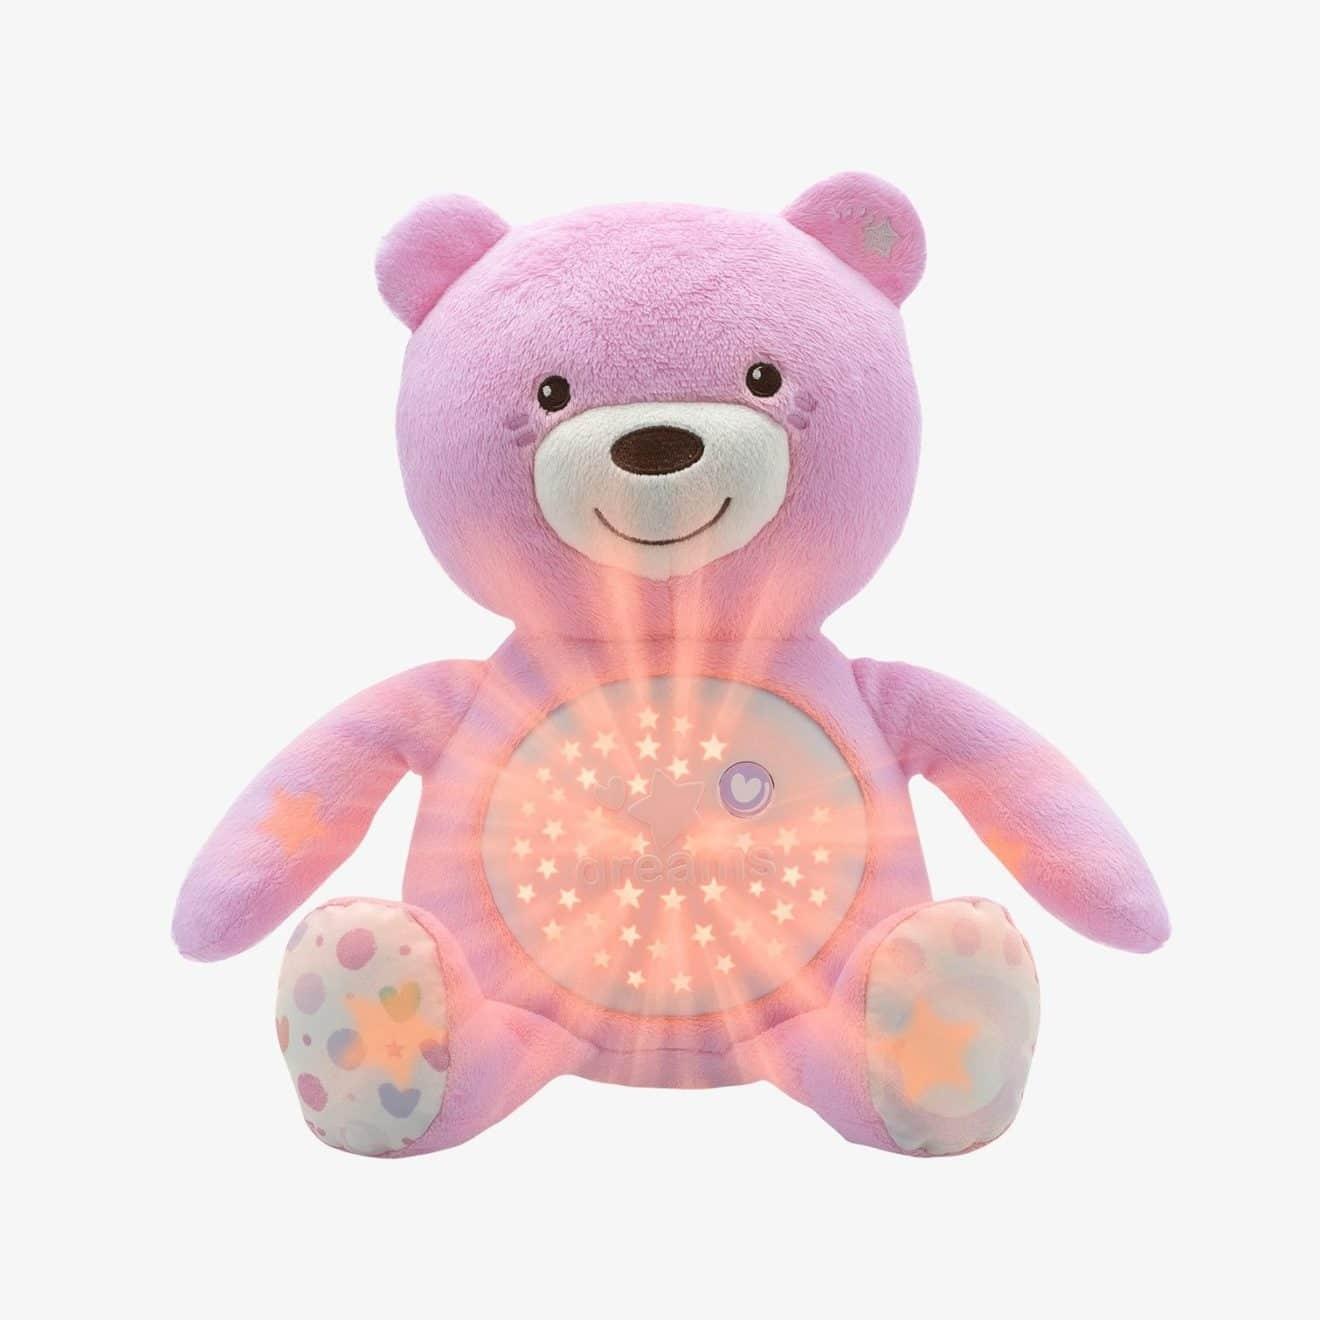 veilleuse-projecteur-etoiles-ourson-baby-bear-chicco-rose